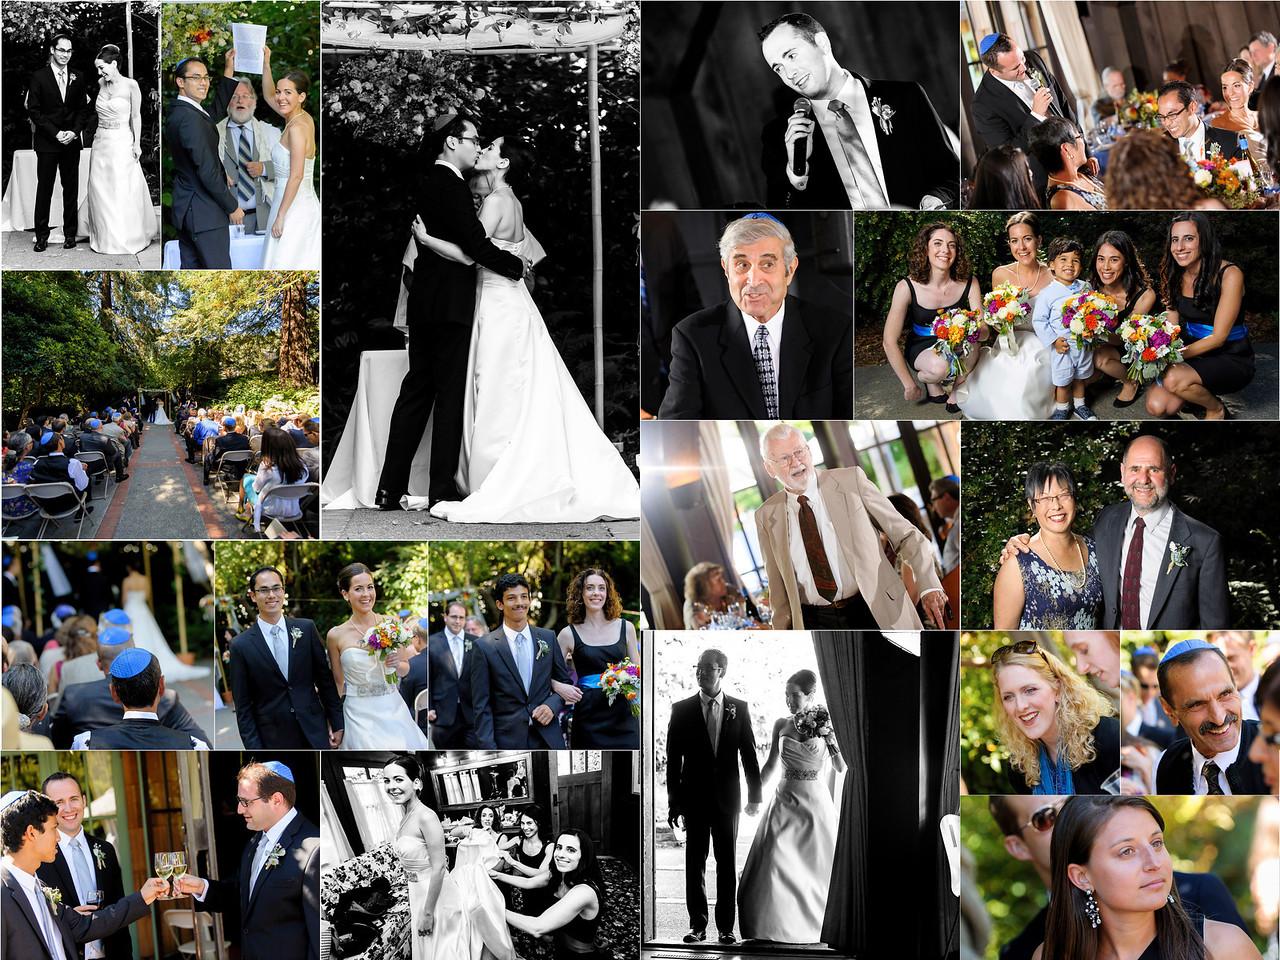 Alyssa_and_Paul_Wedding_Photography_4x6_Photo_Board_05